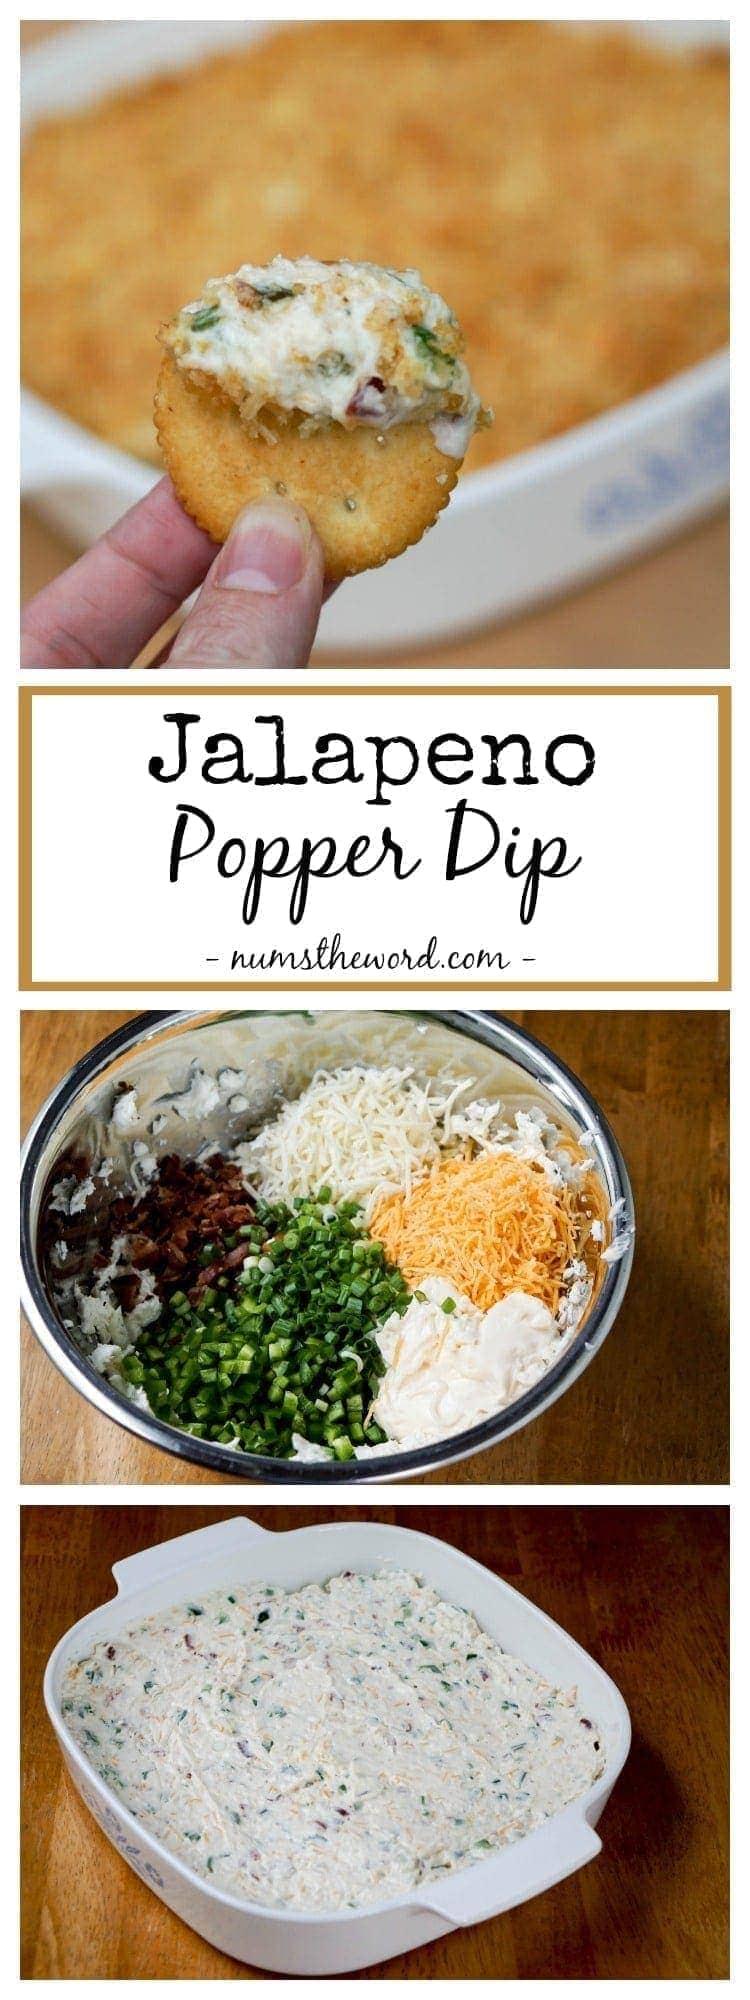 Jalapeno Popper Dip - Pinterest long pin collage